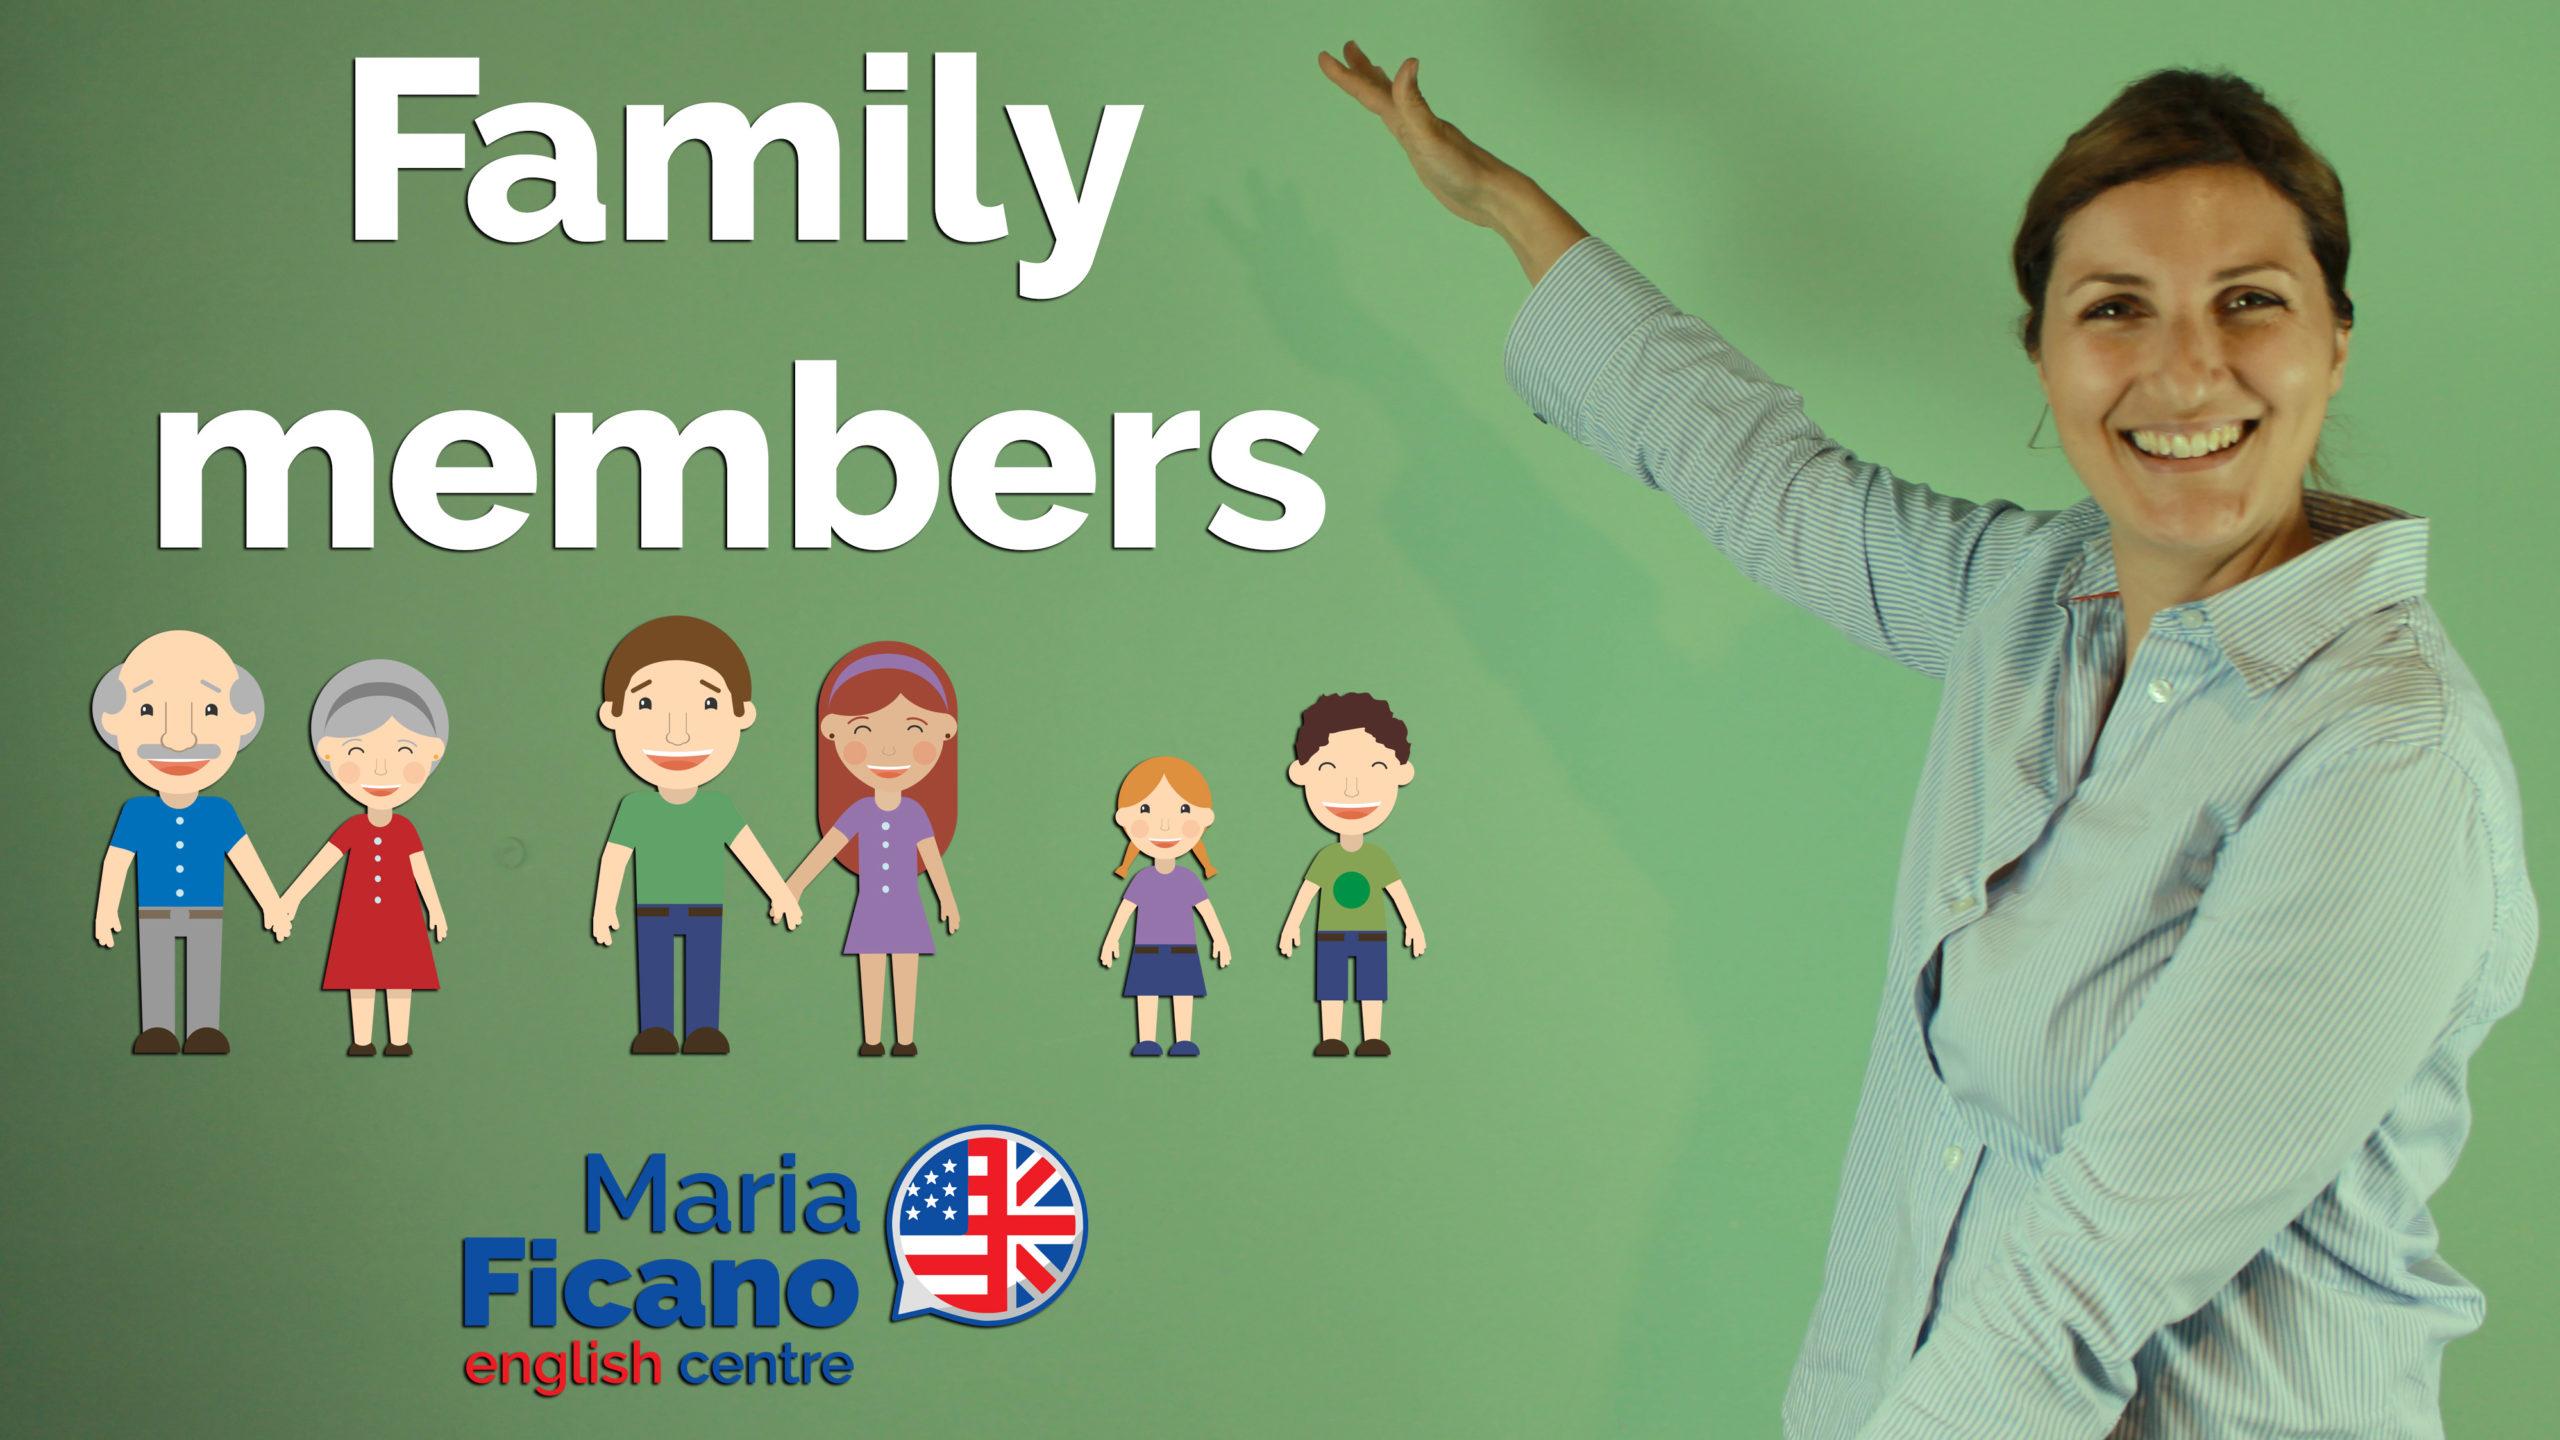 family members inglese famiglia